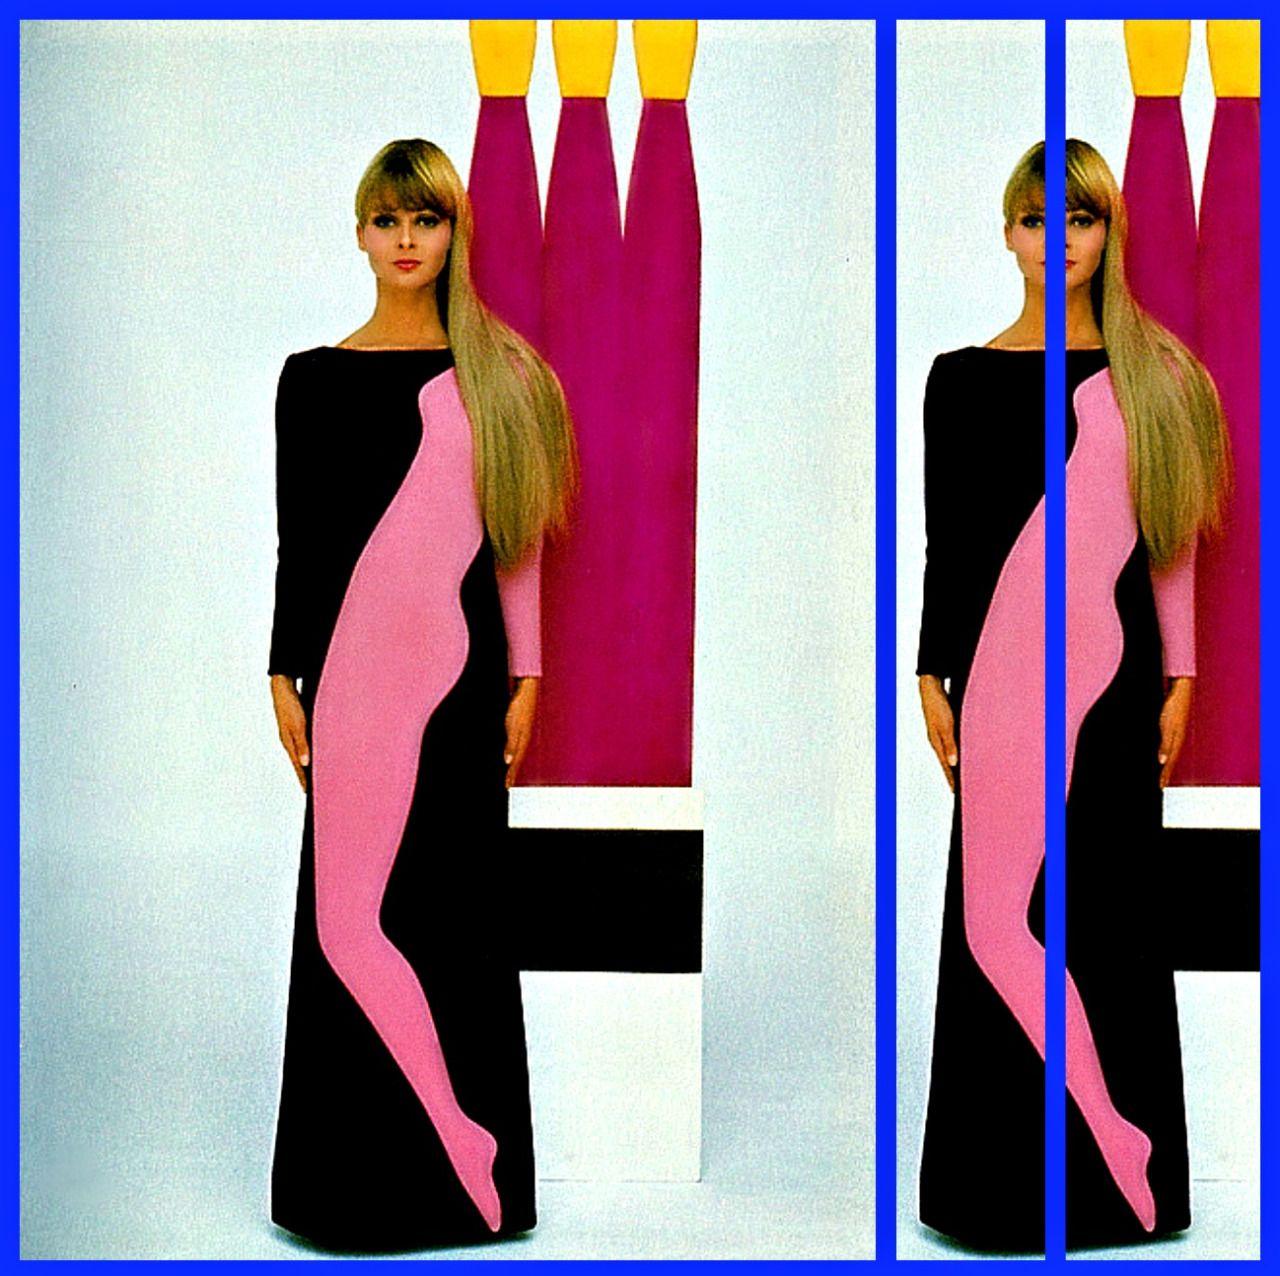 Extrêmement Pop Art Dress from Yves Saint Laurent - 1966 | 1966 - 1967  RM47